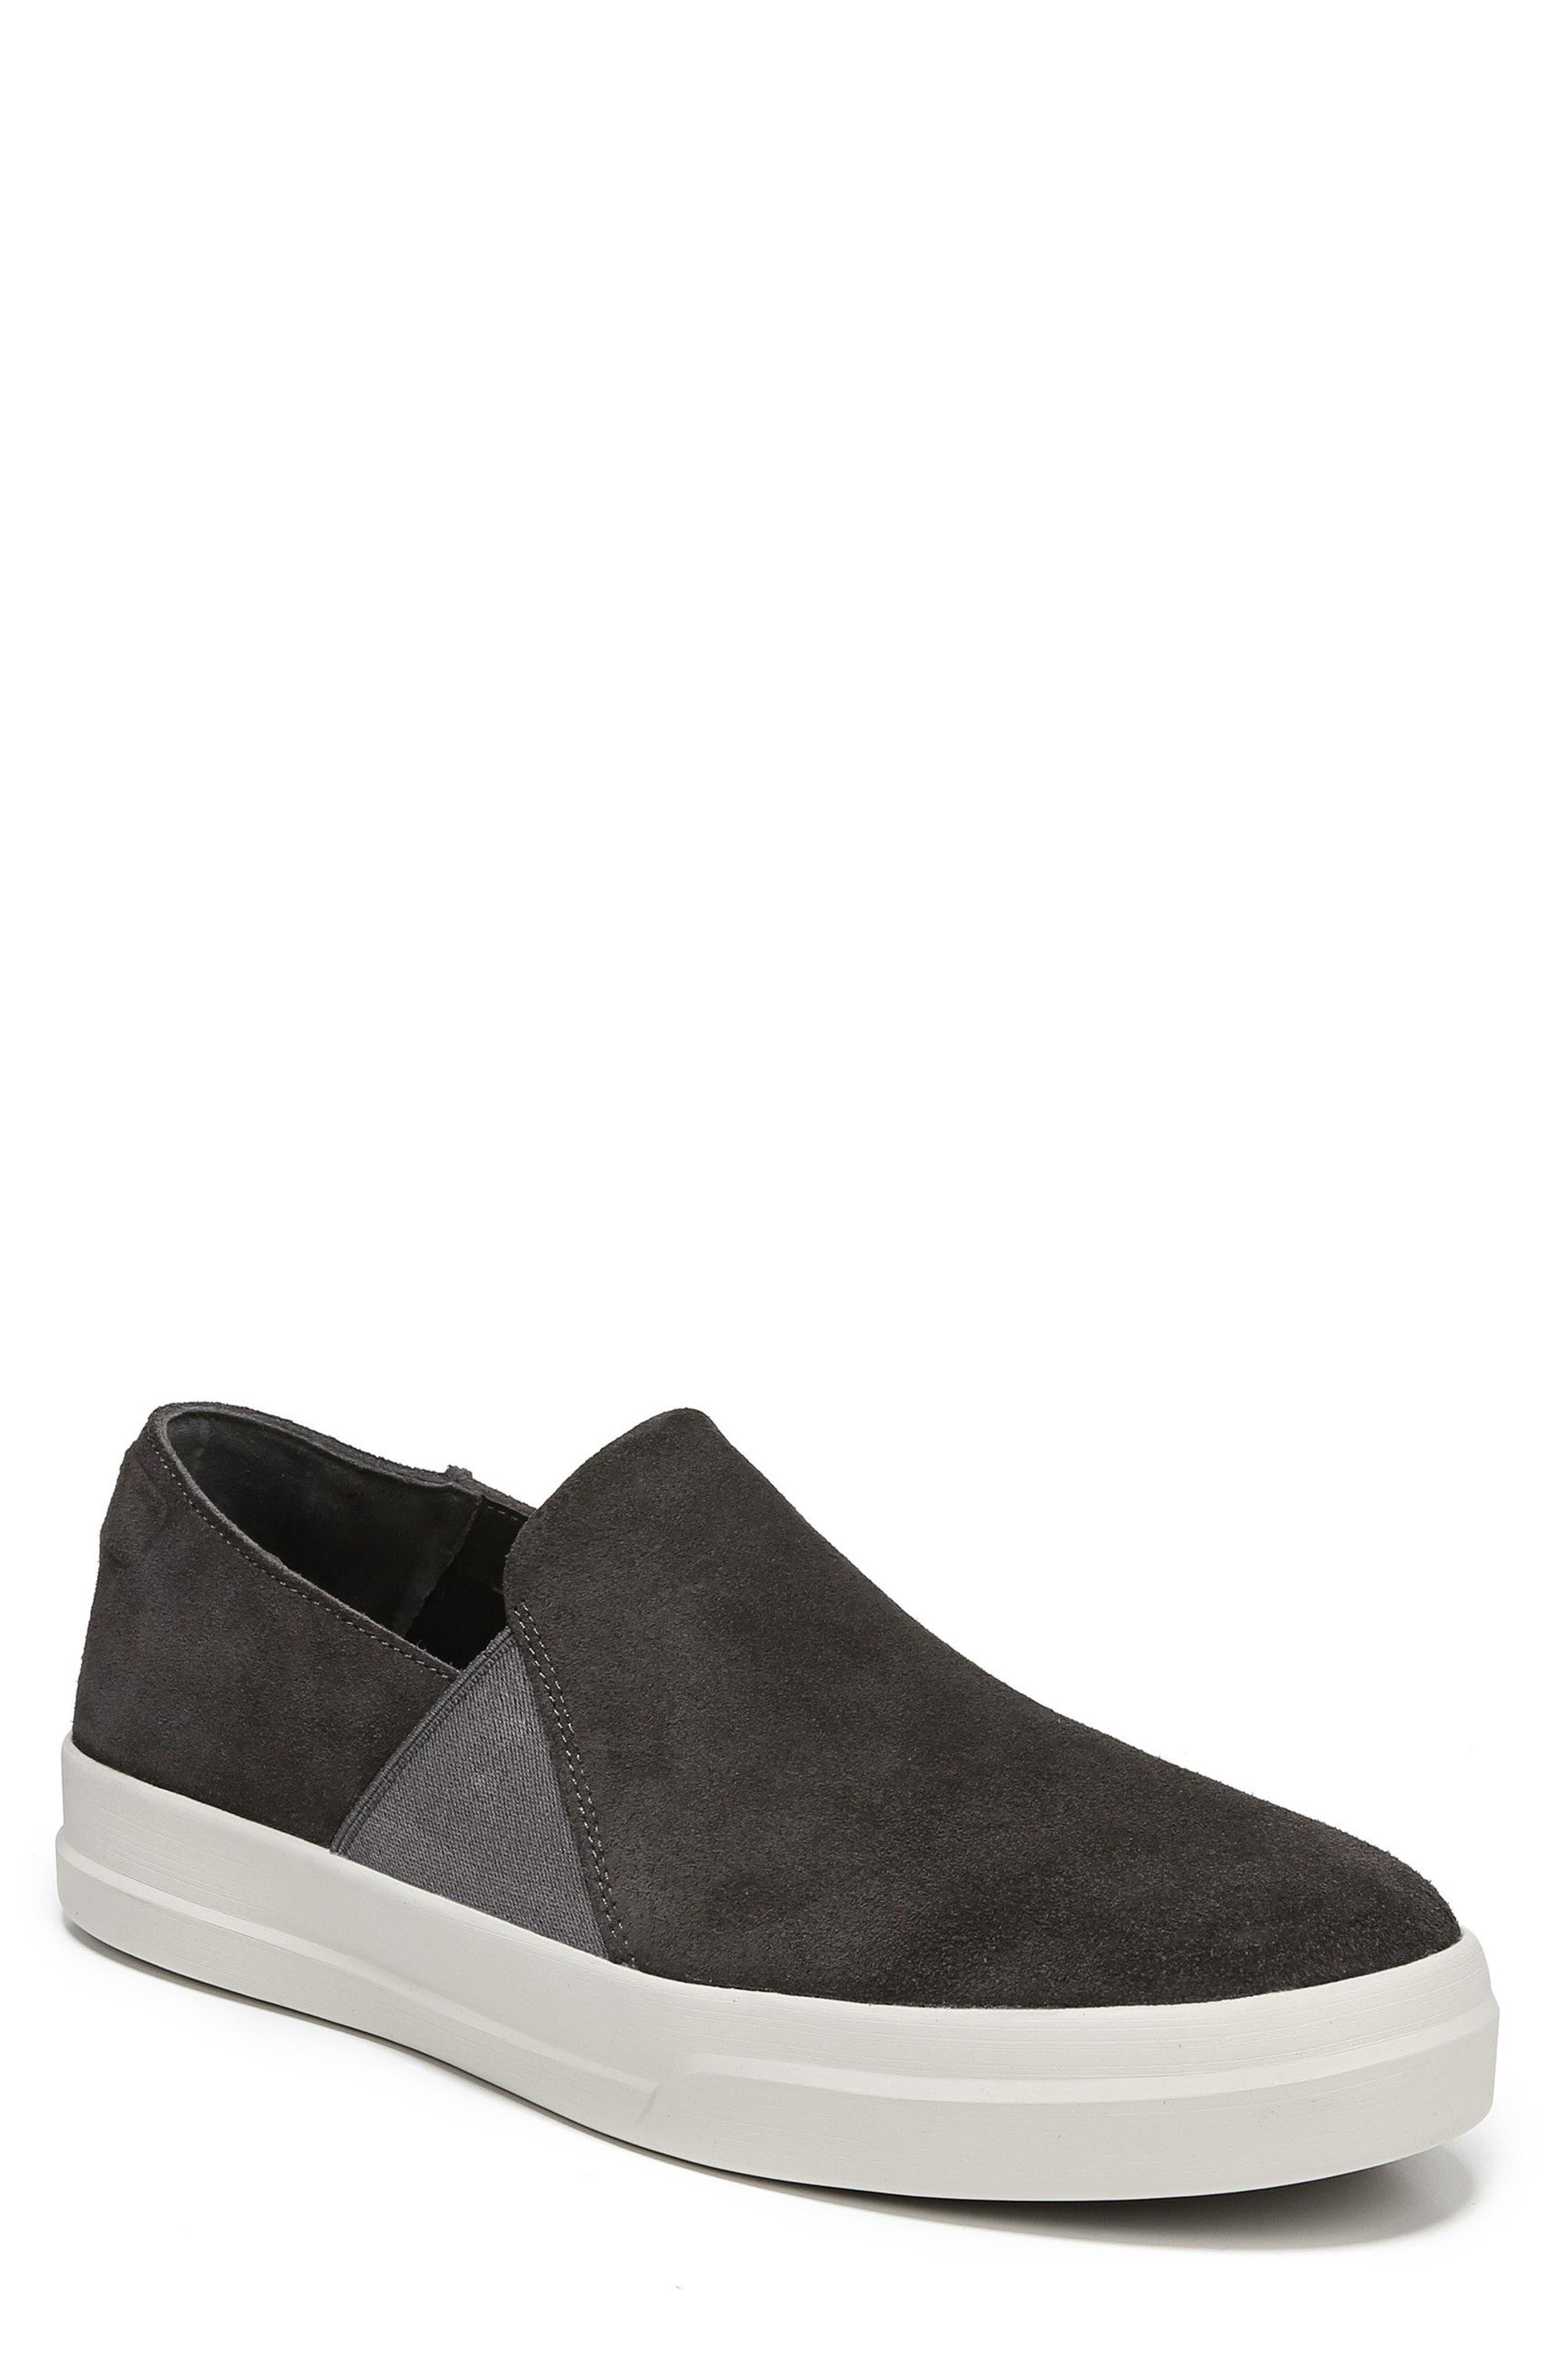 Carlin Slip-On Sneaker,                             Main thumbnail 1, color,                             020